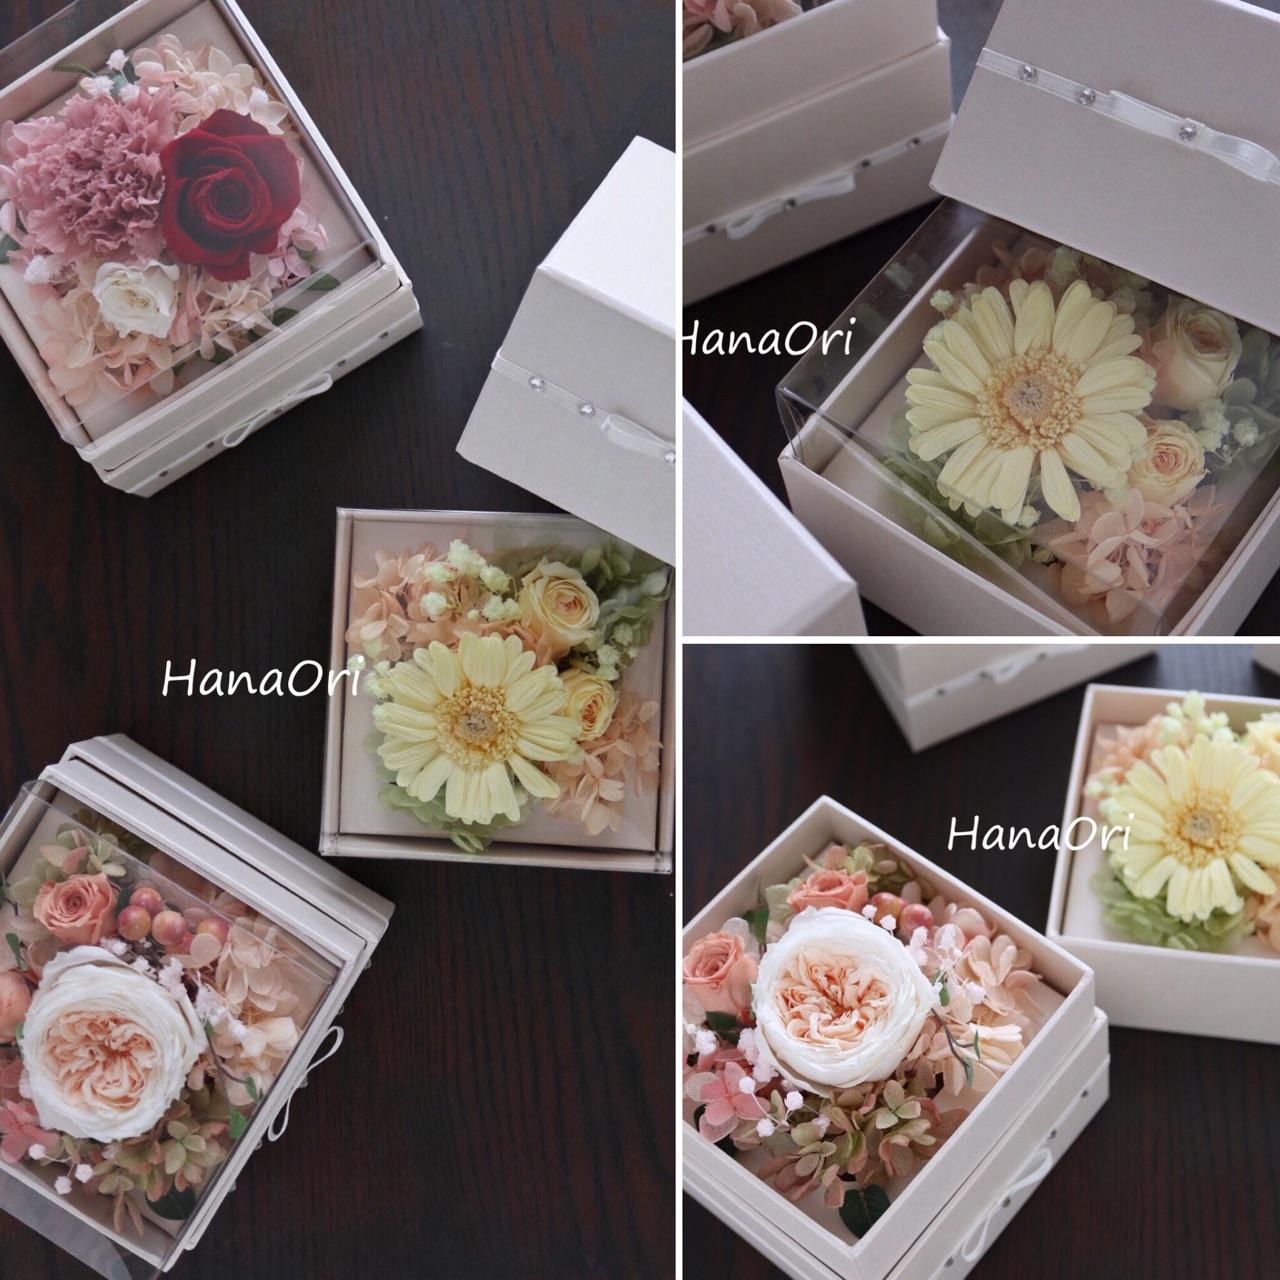 https://www.hanaori.com/blog1/images/2017.0502_5.jpg